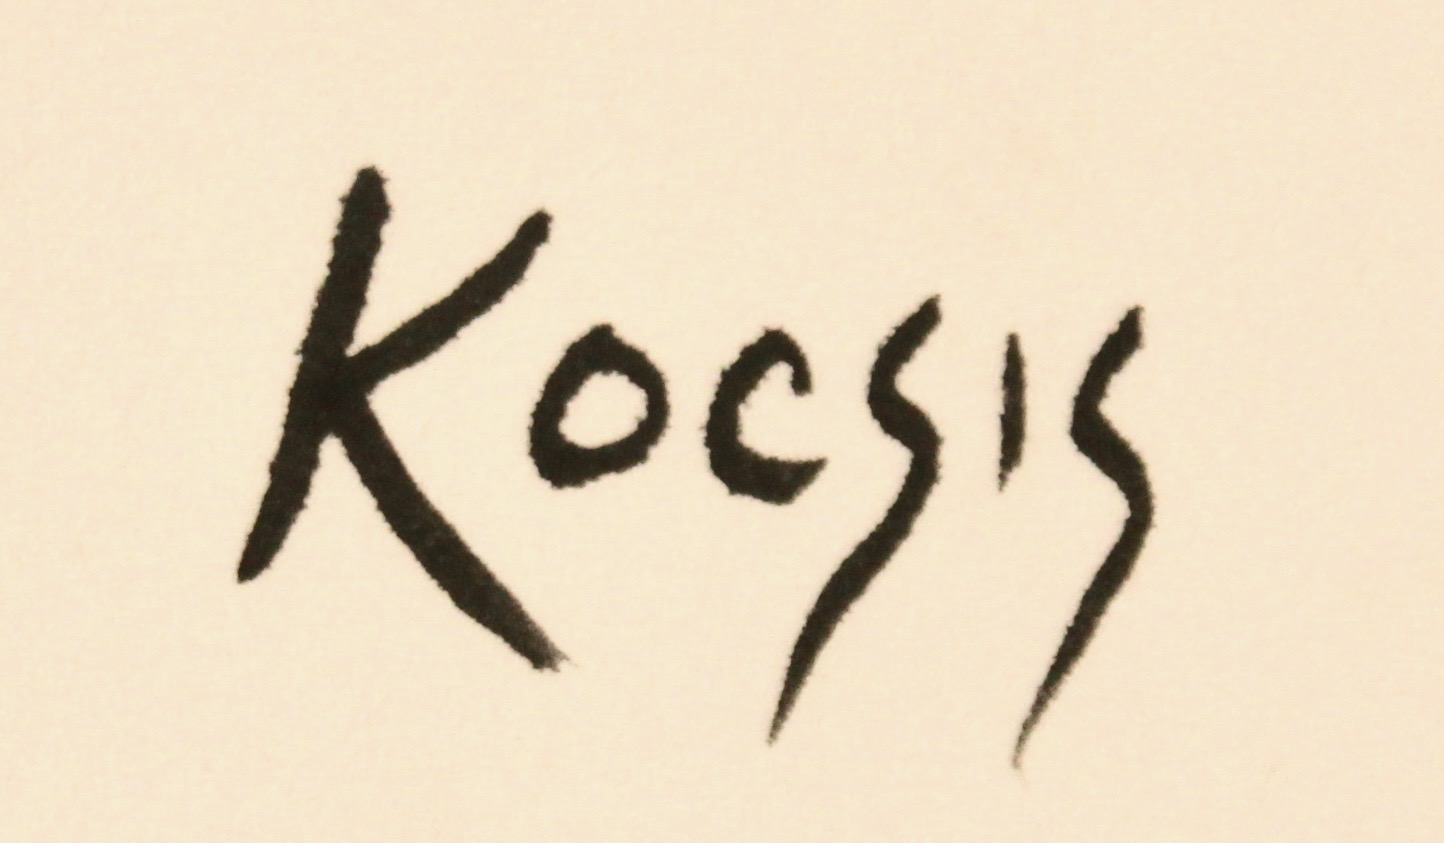 Rollin kocsis's Signature